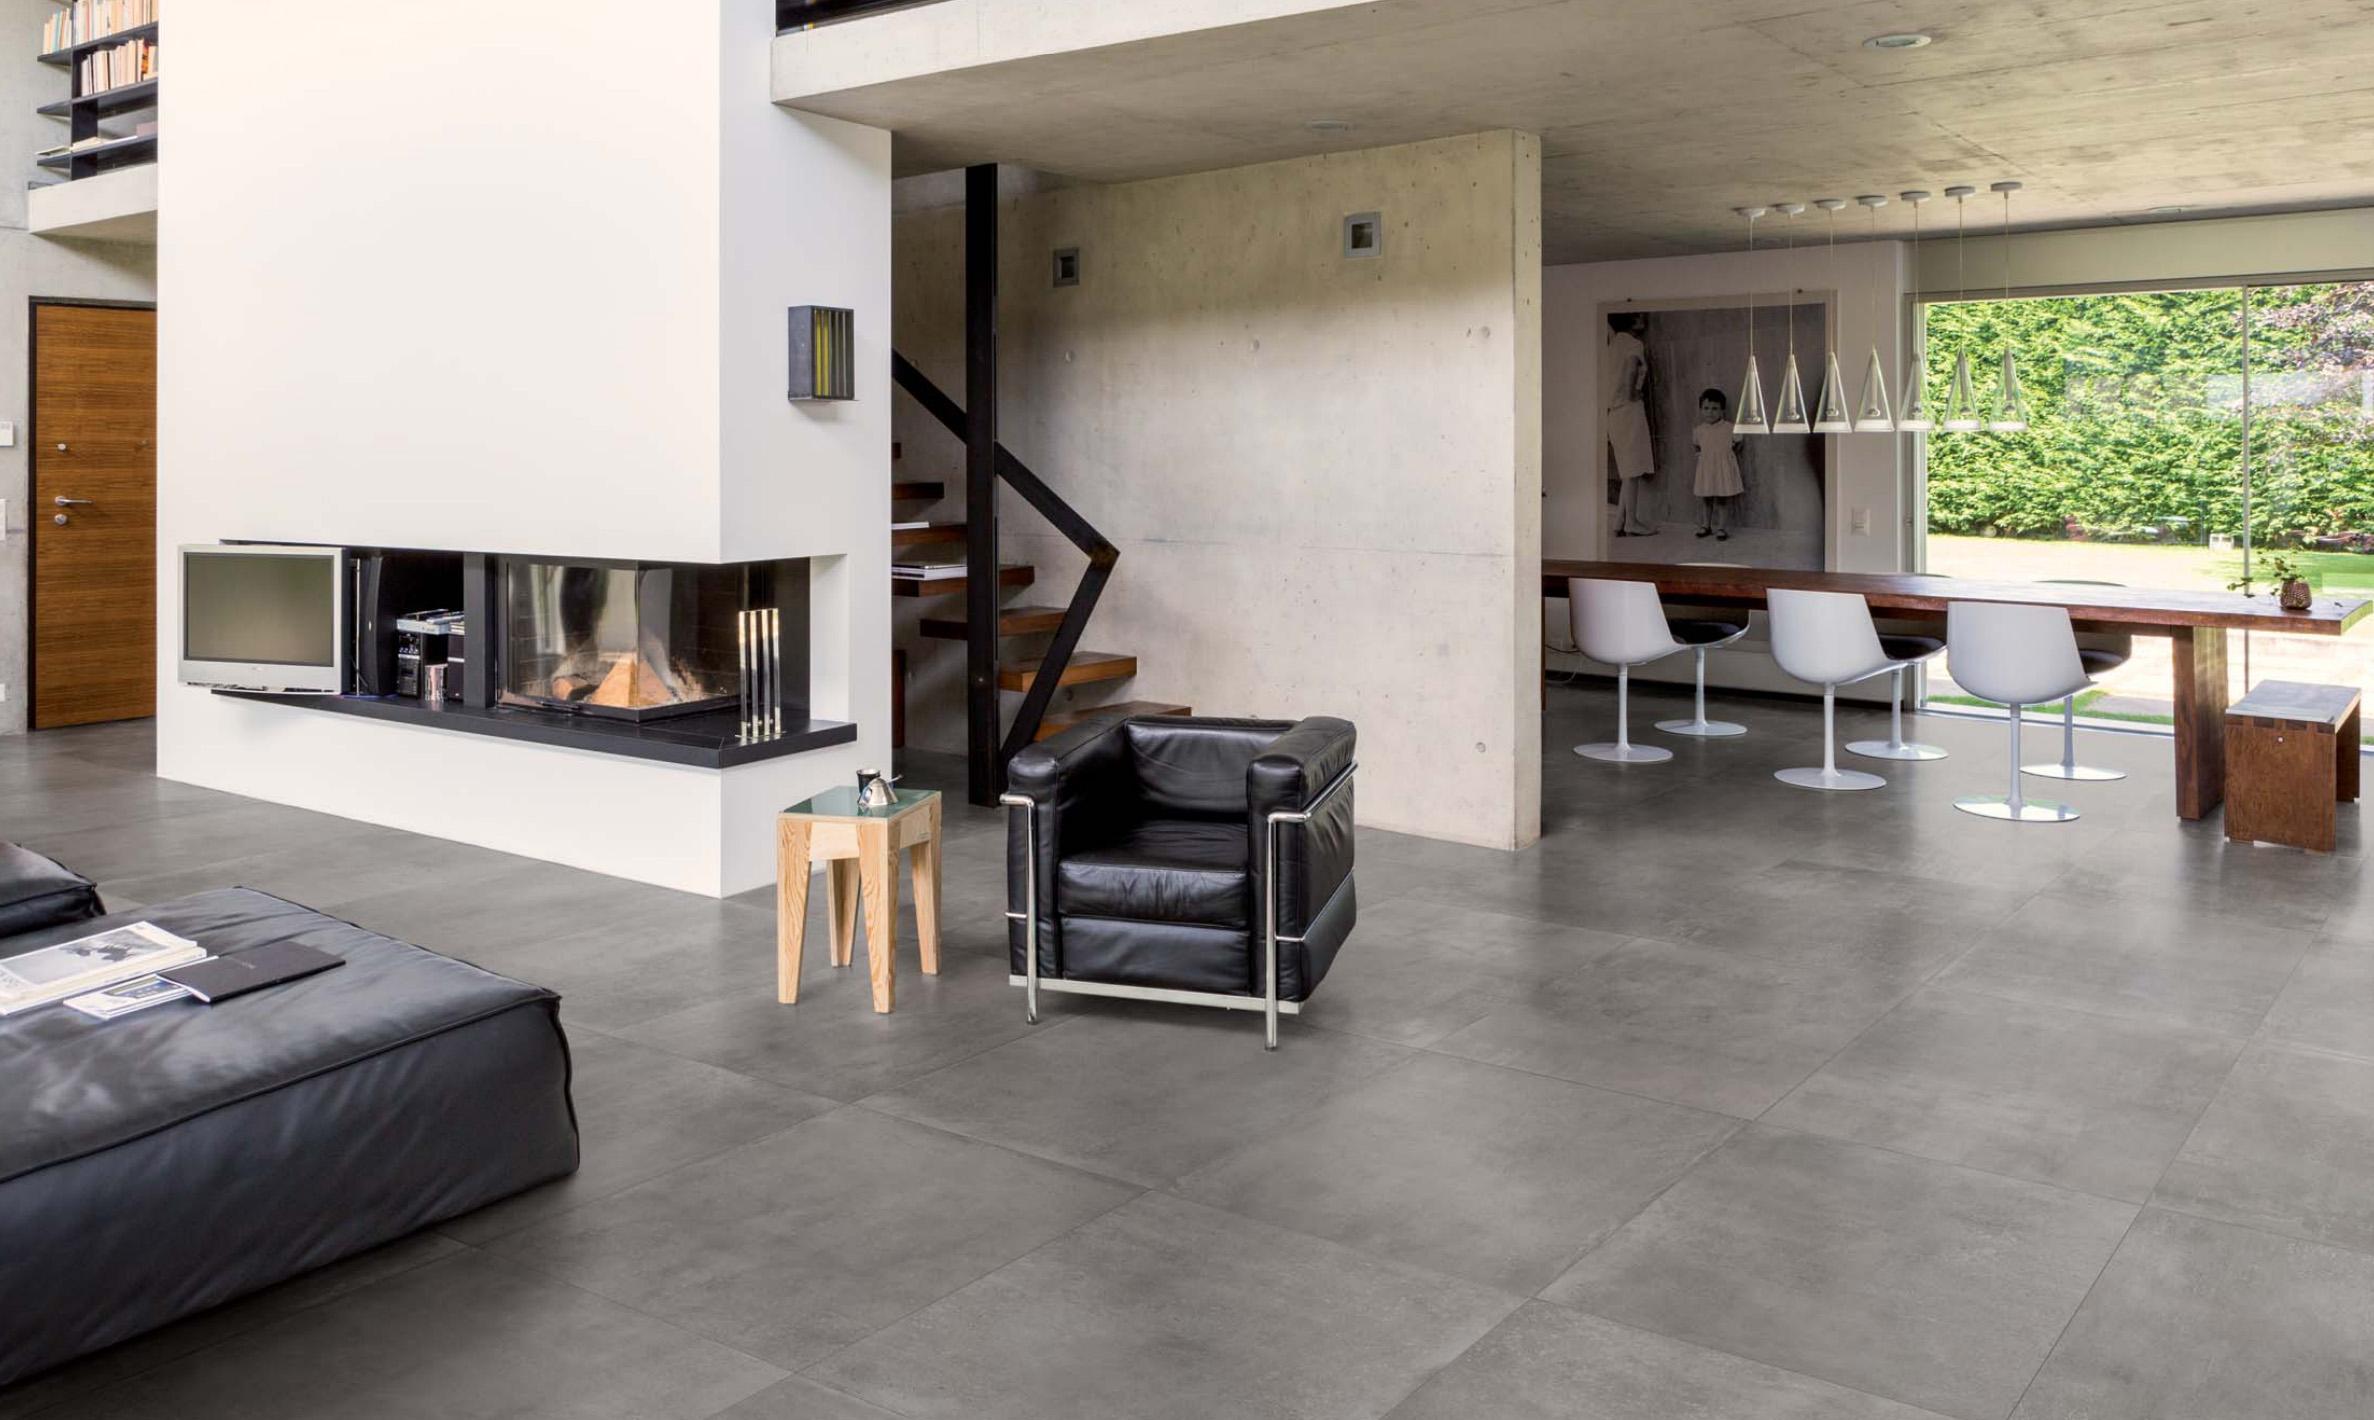 Moderne radiator badkamer badkamer ontwerp idee n voor uw huis samen met meubels - Am pm meubels ...